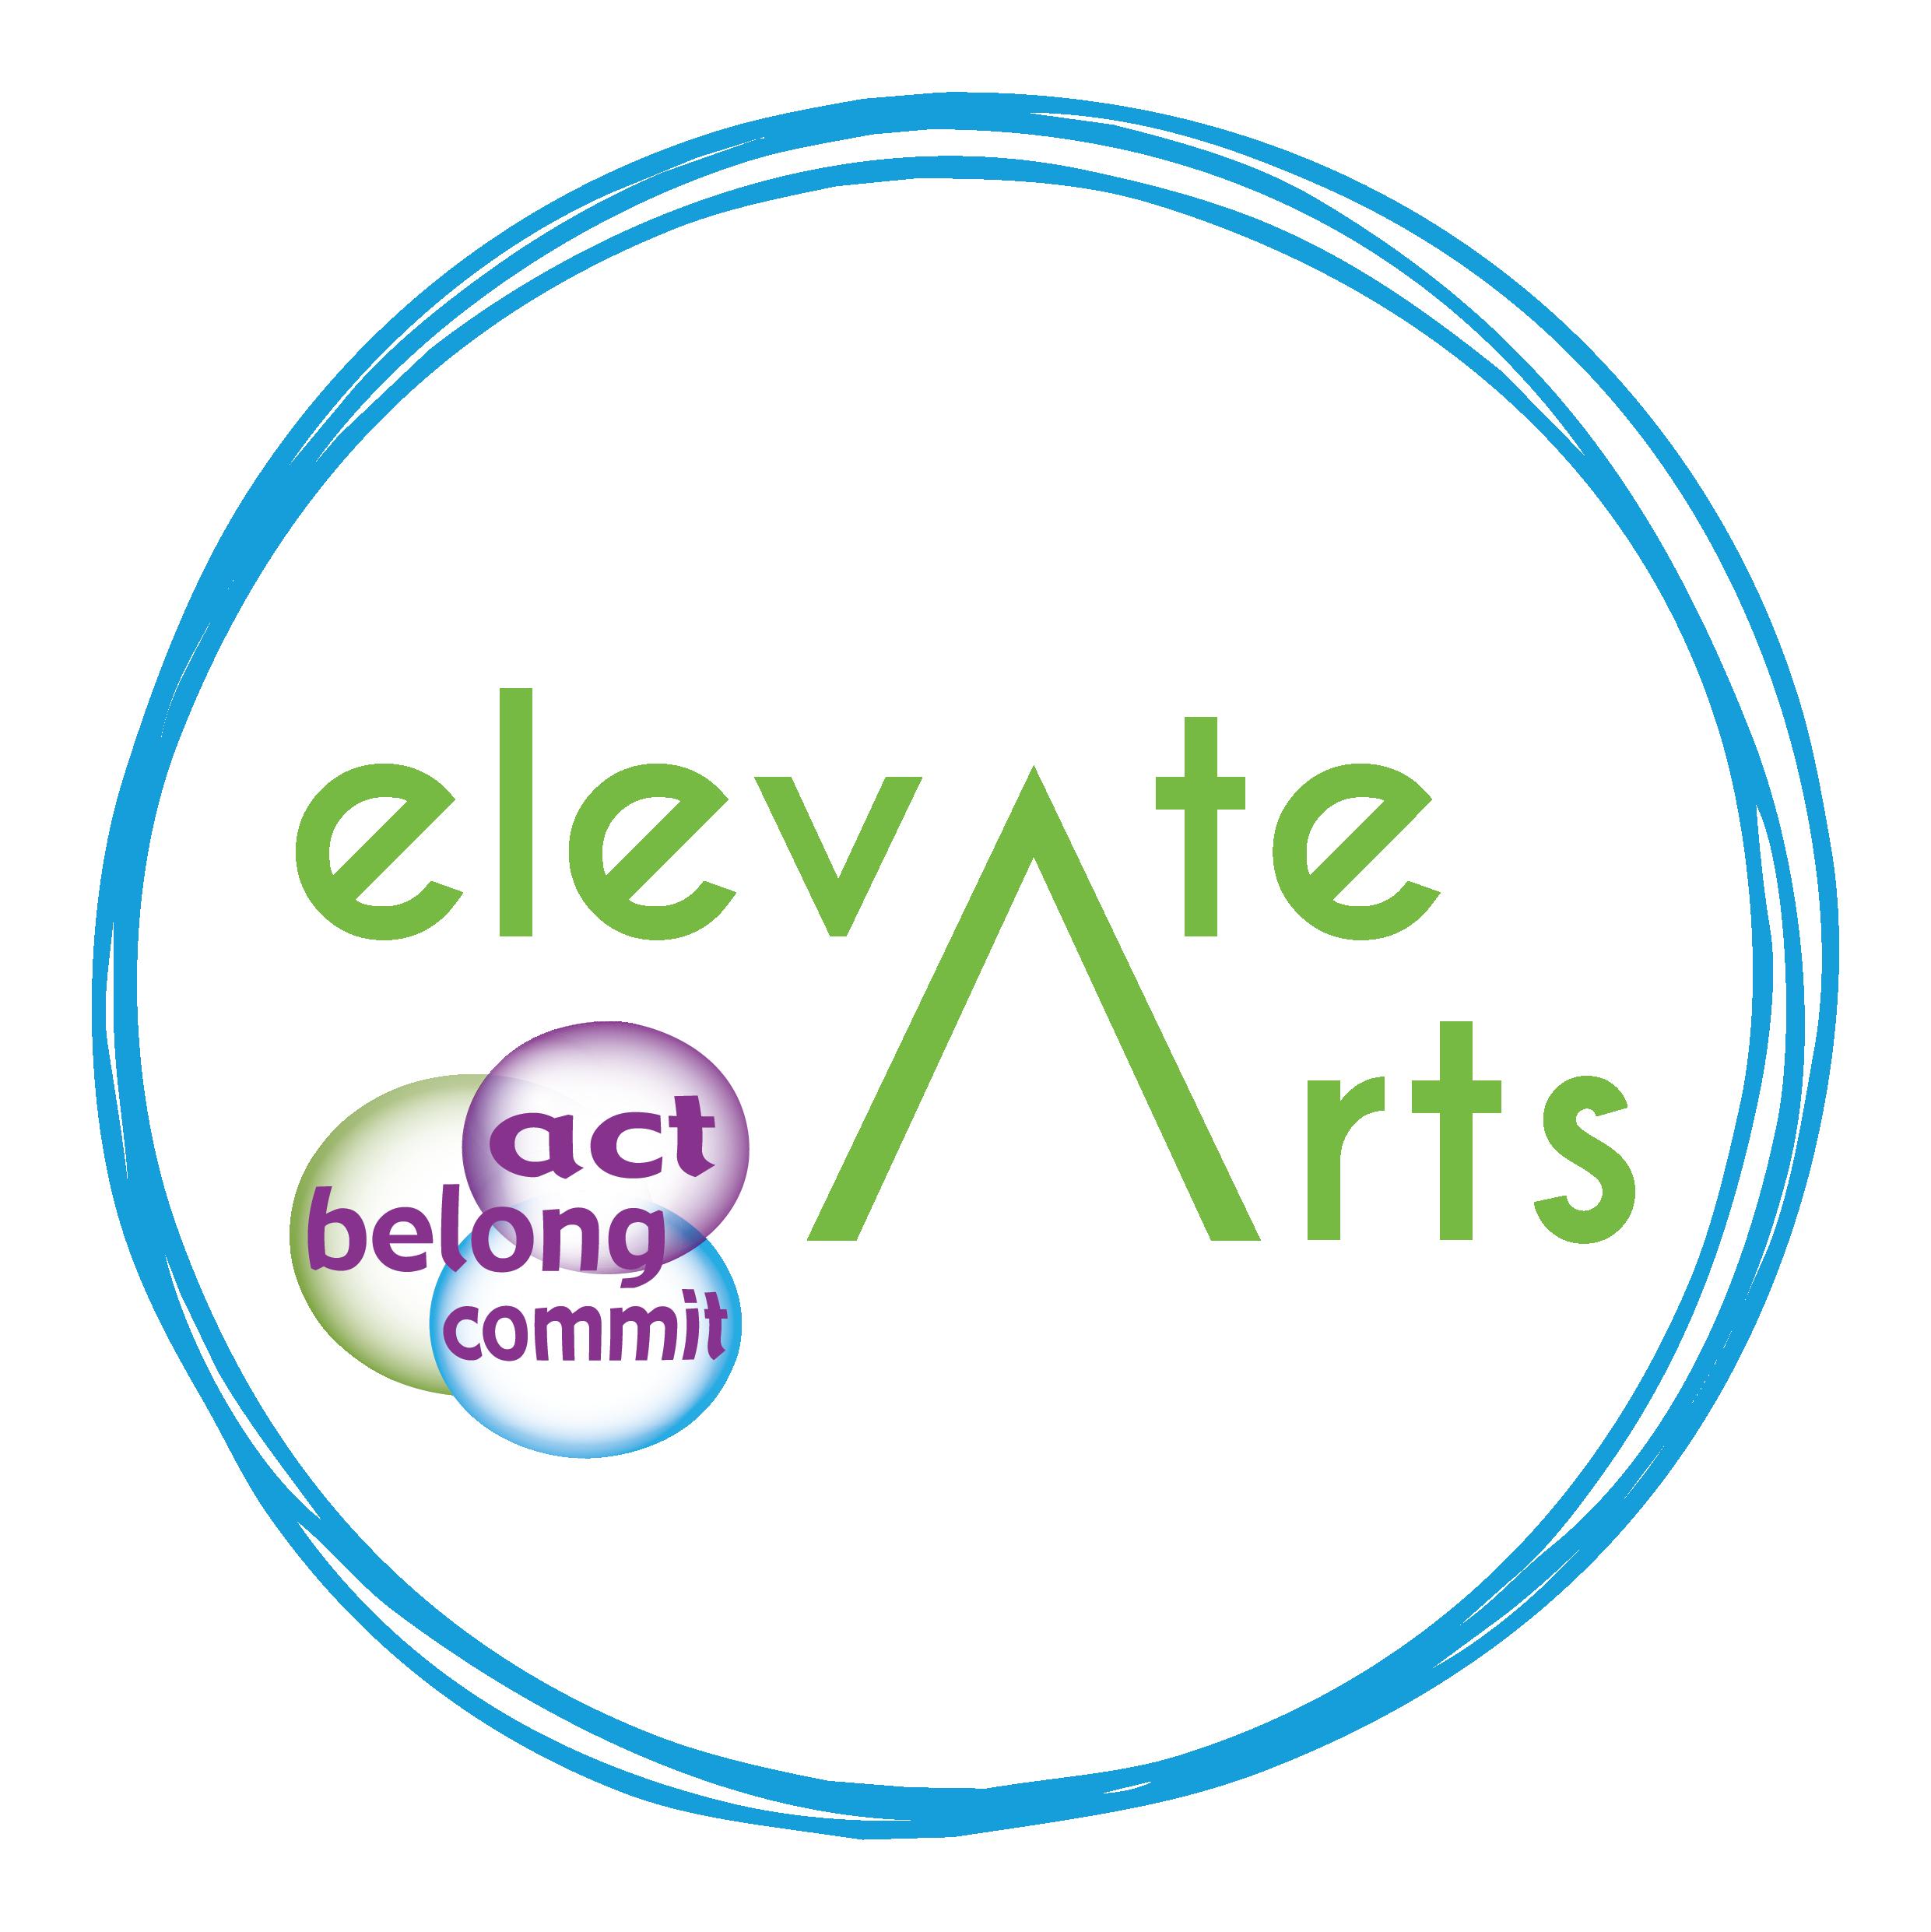 LG_Elevate Arts_Circle_Colour.png